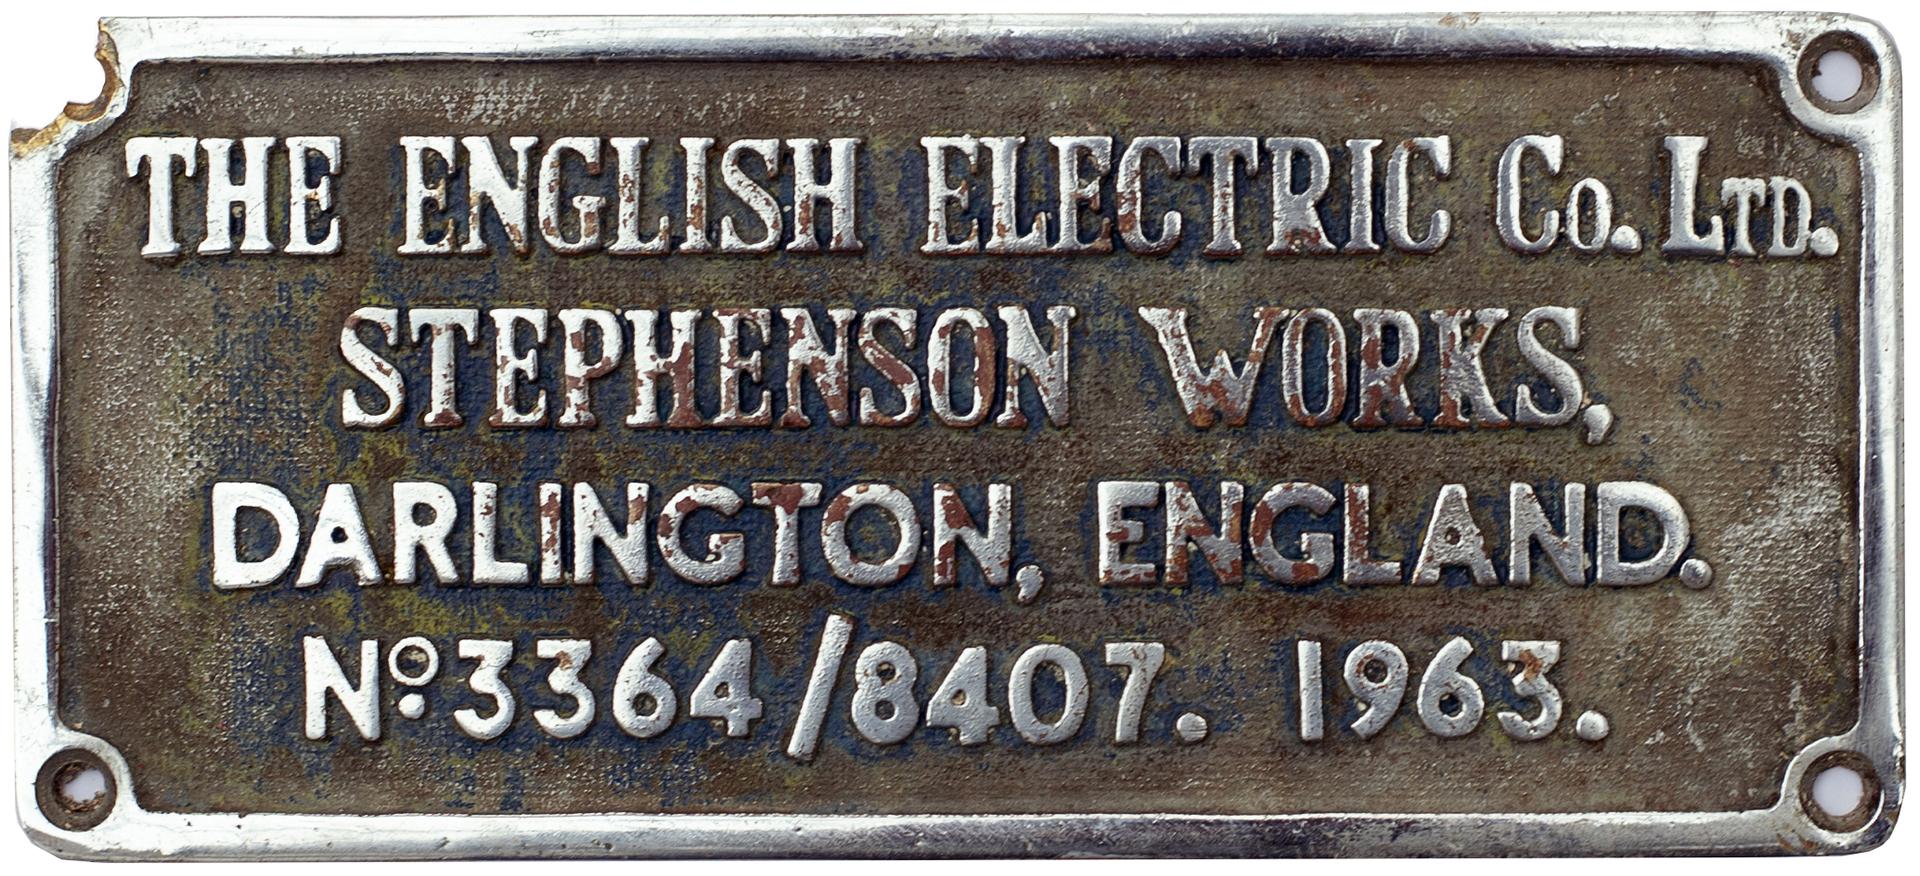 Worksplate THE ENGLISH ELECTRIC CO LTD STEPHENSON WORKS DARLINGTON ENGLAND No 3364/8407 1963 ex